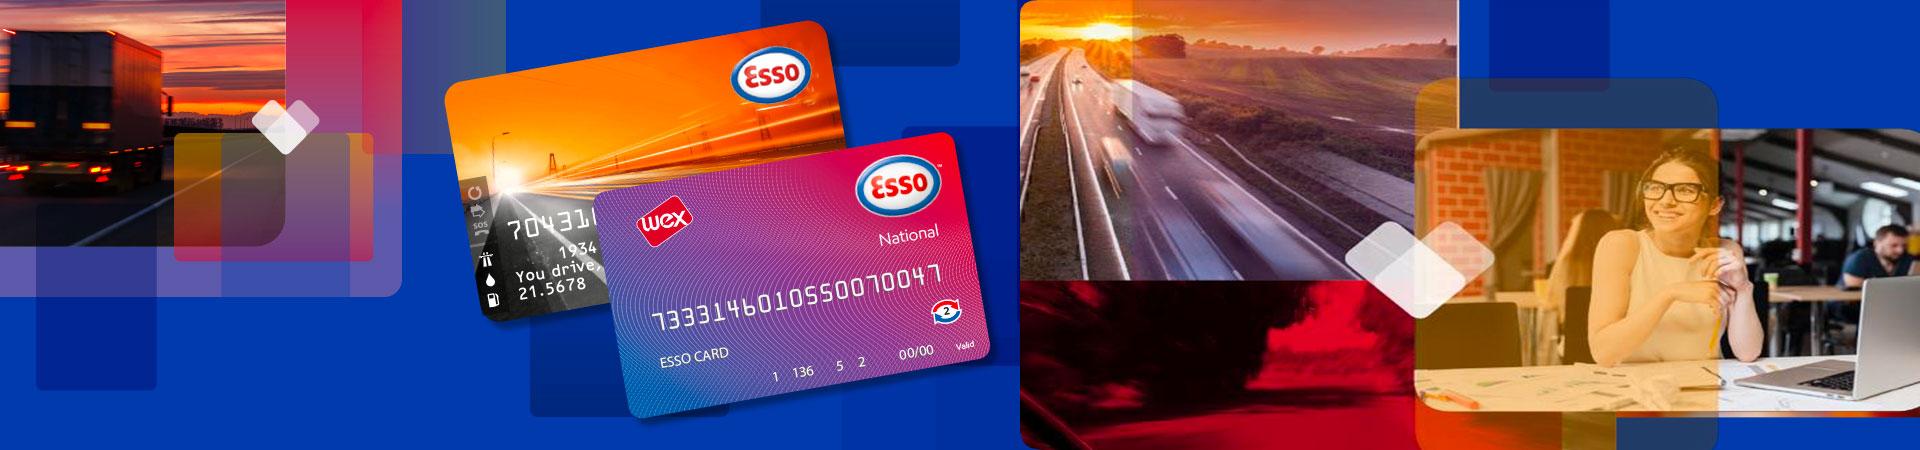 Esso-card Retitalia